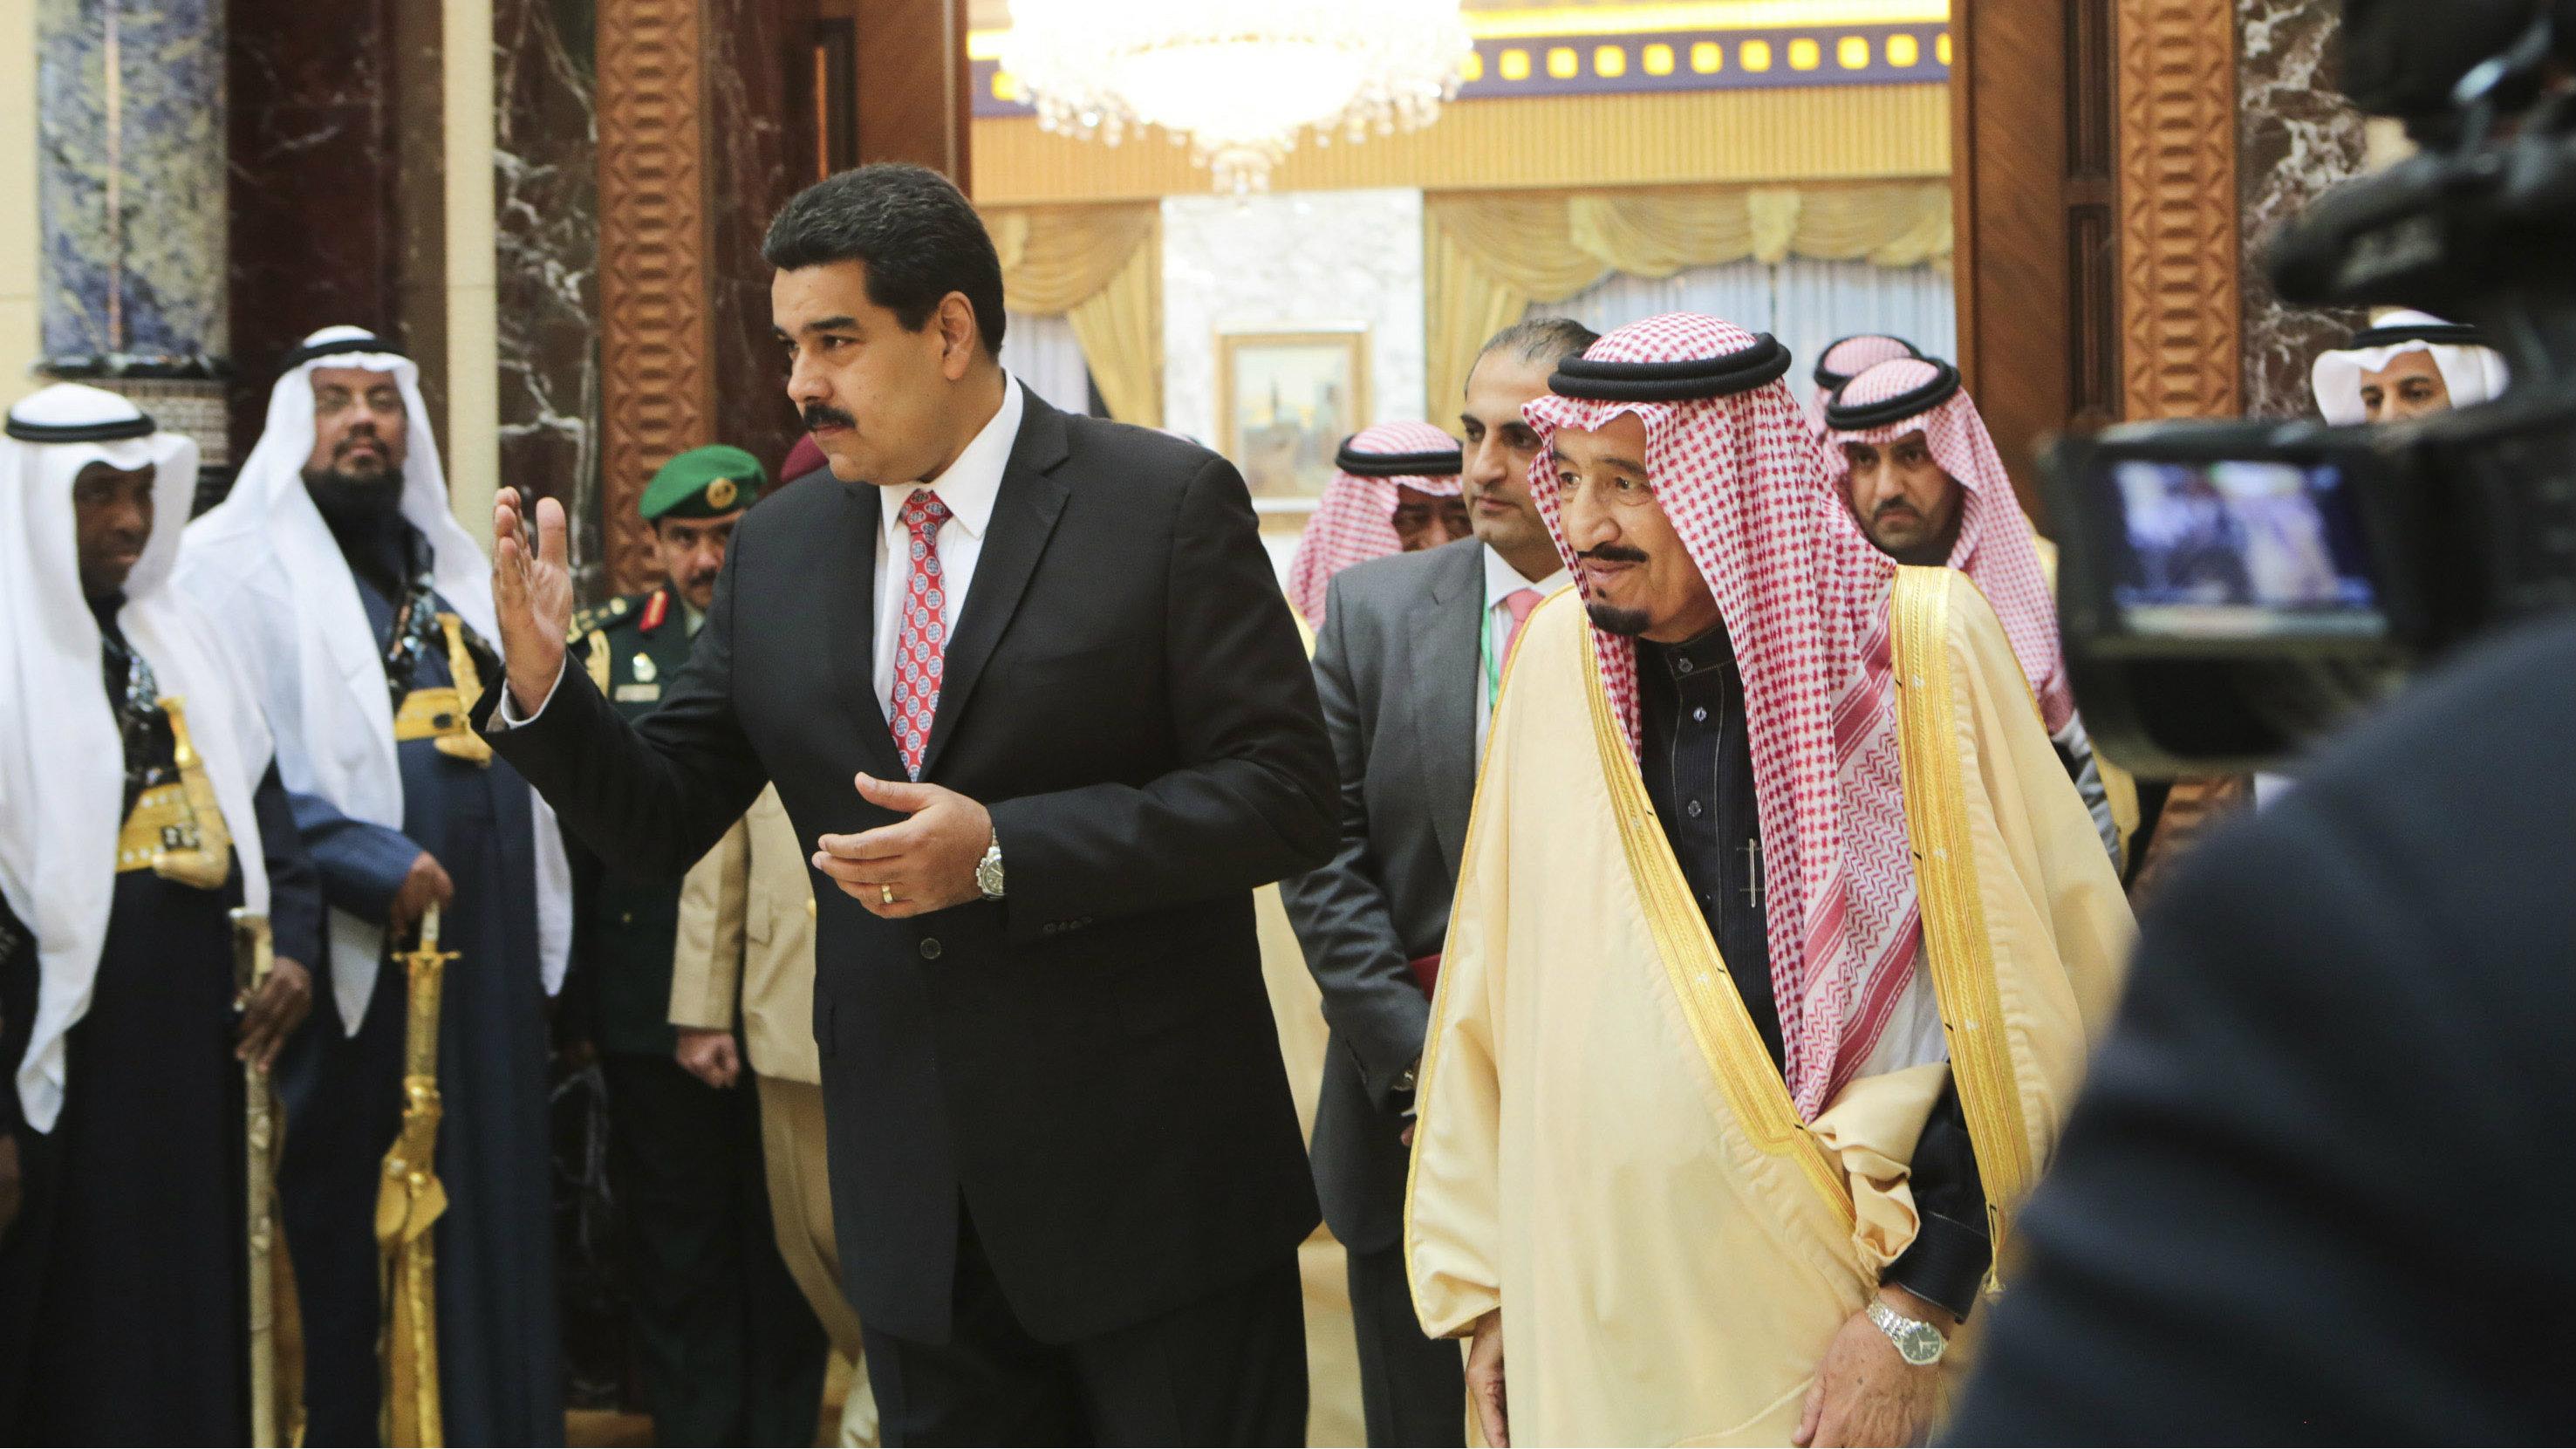 Venezuela's President Nicolas Maduro is welcomed by Saudi Arabia's Crown Prince Salman in Riyadh January 11, 2015.